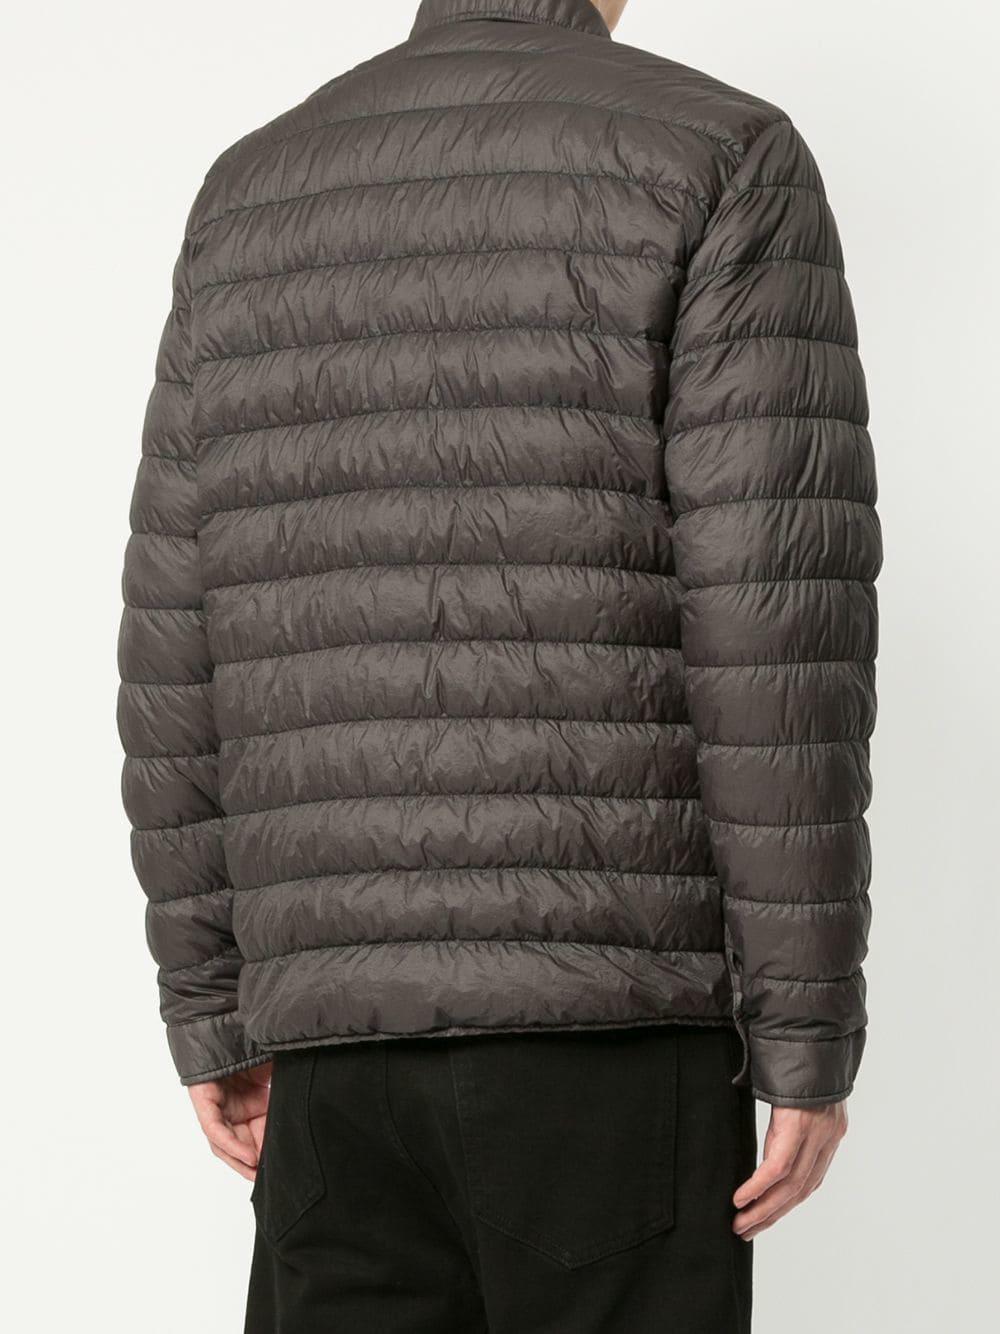 500bf367cbd27 Lyst - Stone Island Garment Dyed Micro-yarn Down Packable in Black ...